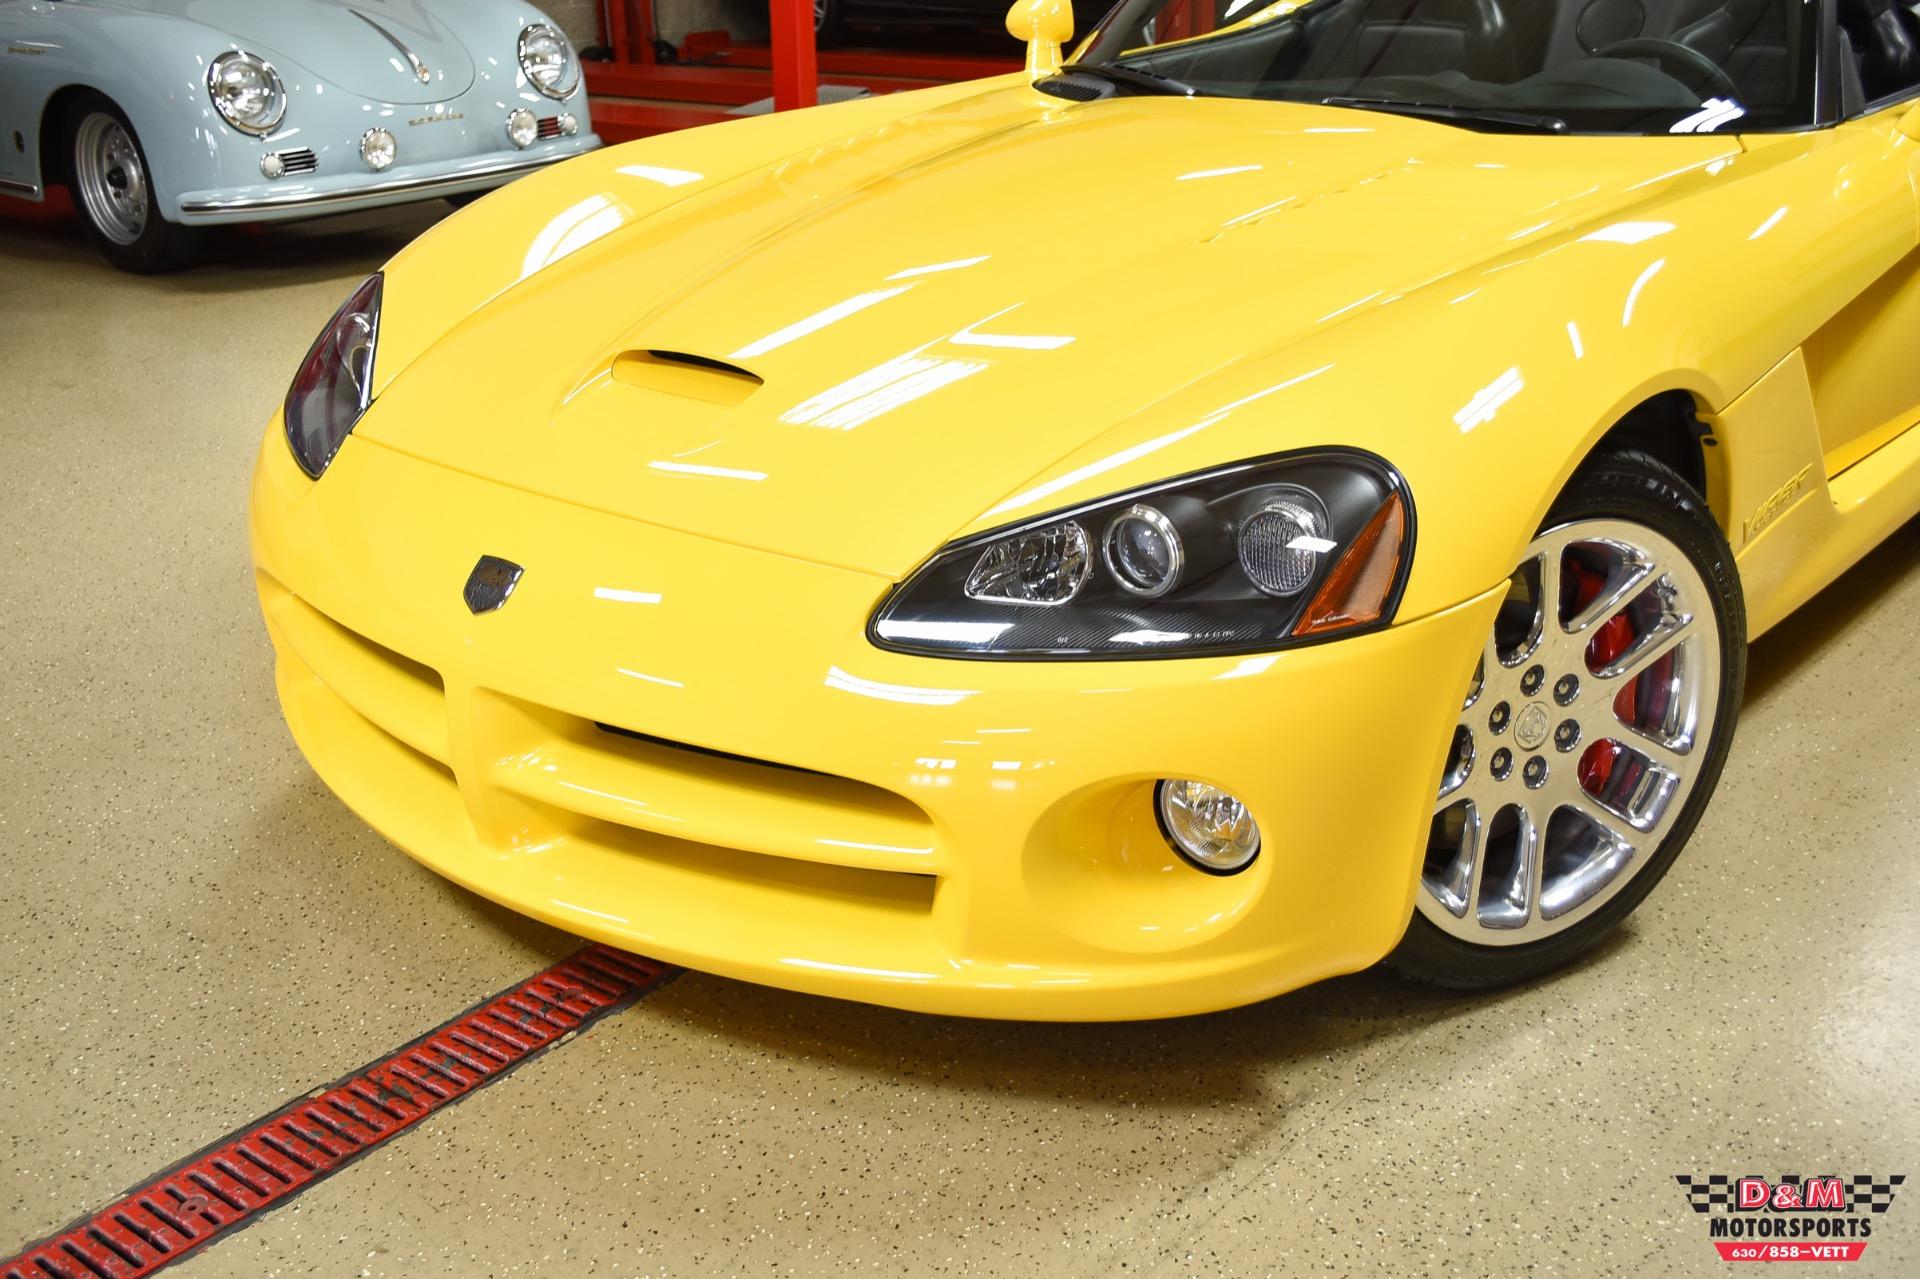 Used 2005 Dodge Viper SRT-10 Convertible | Glen Ellyn, IL